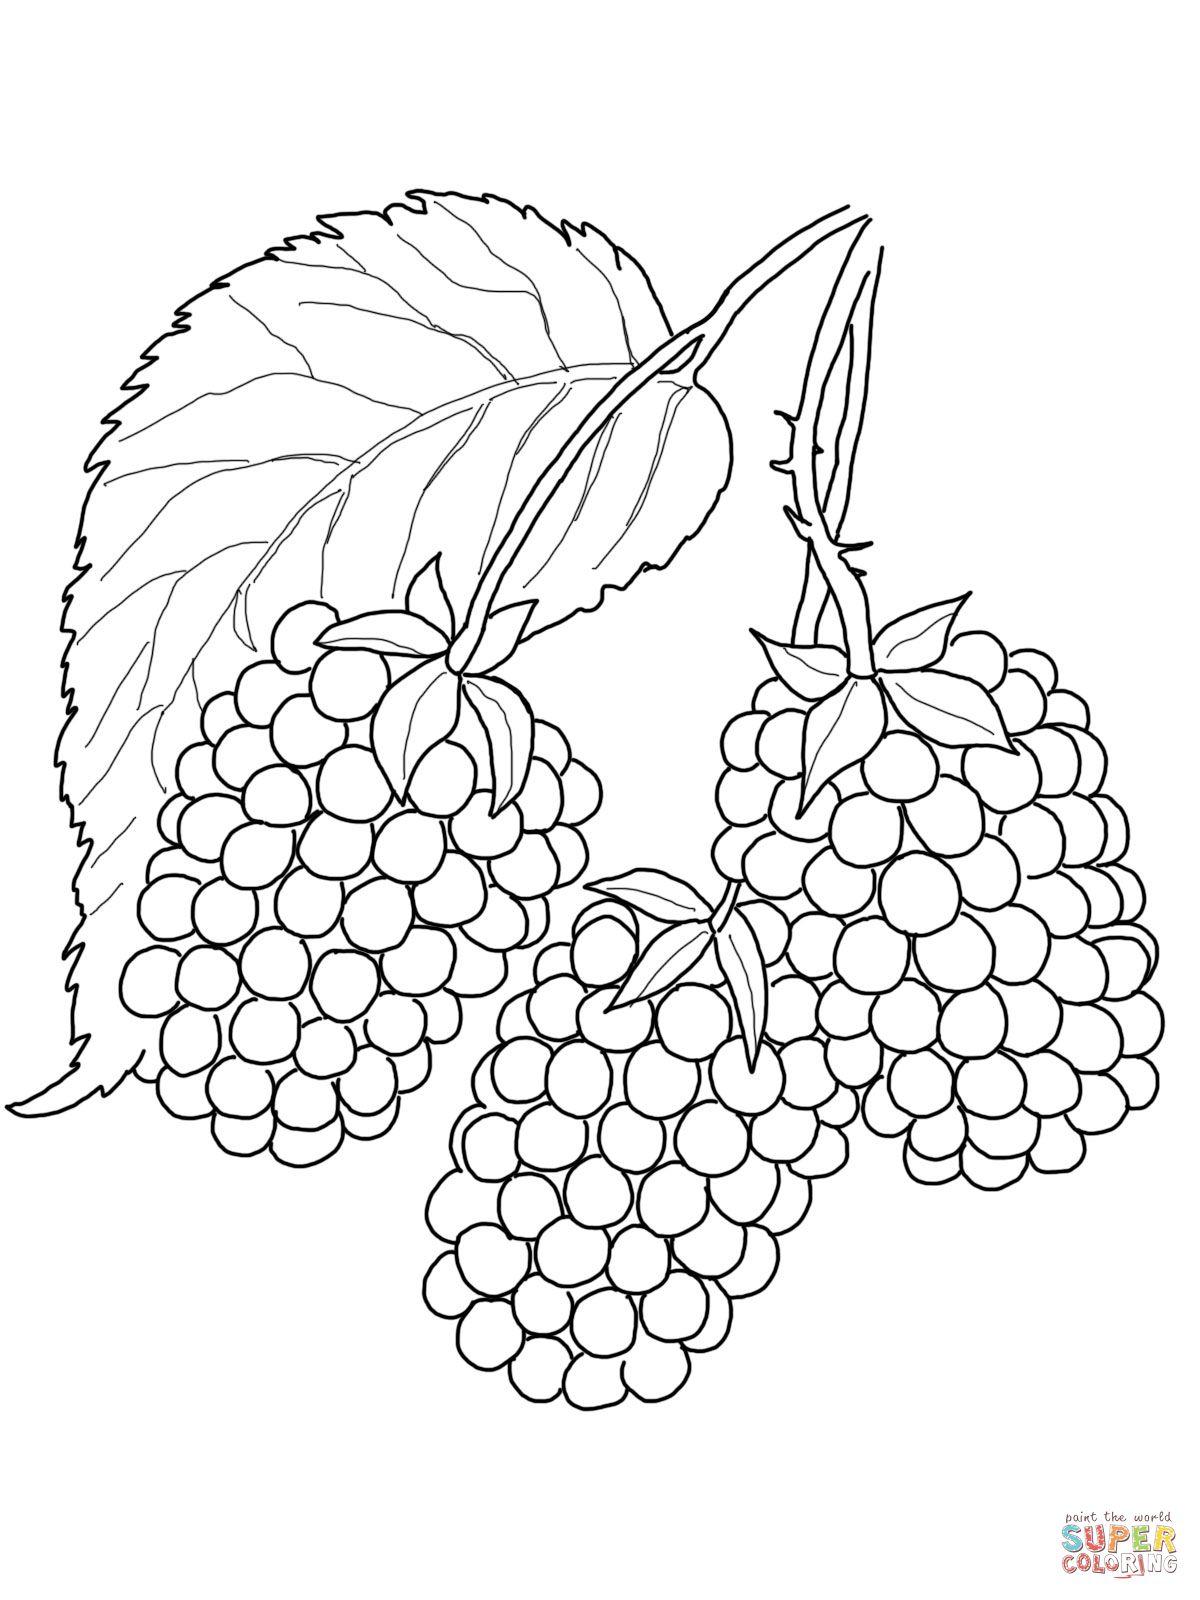 Images For Blackberry Fruit Drawing Fruit Coloring Pages Coloring Pages Free Printable Coloring